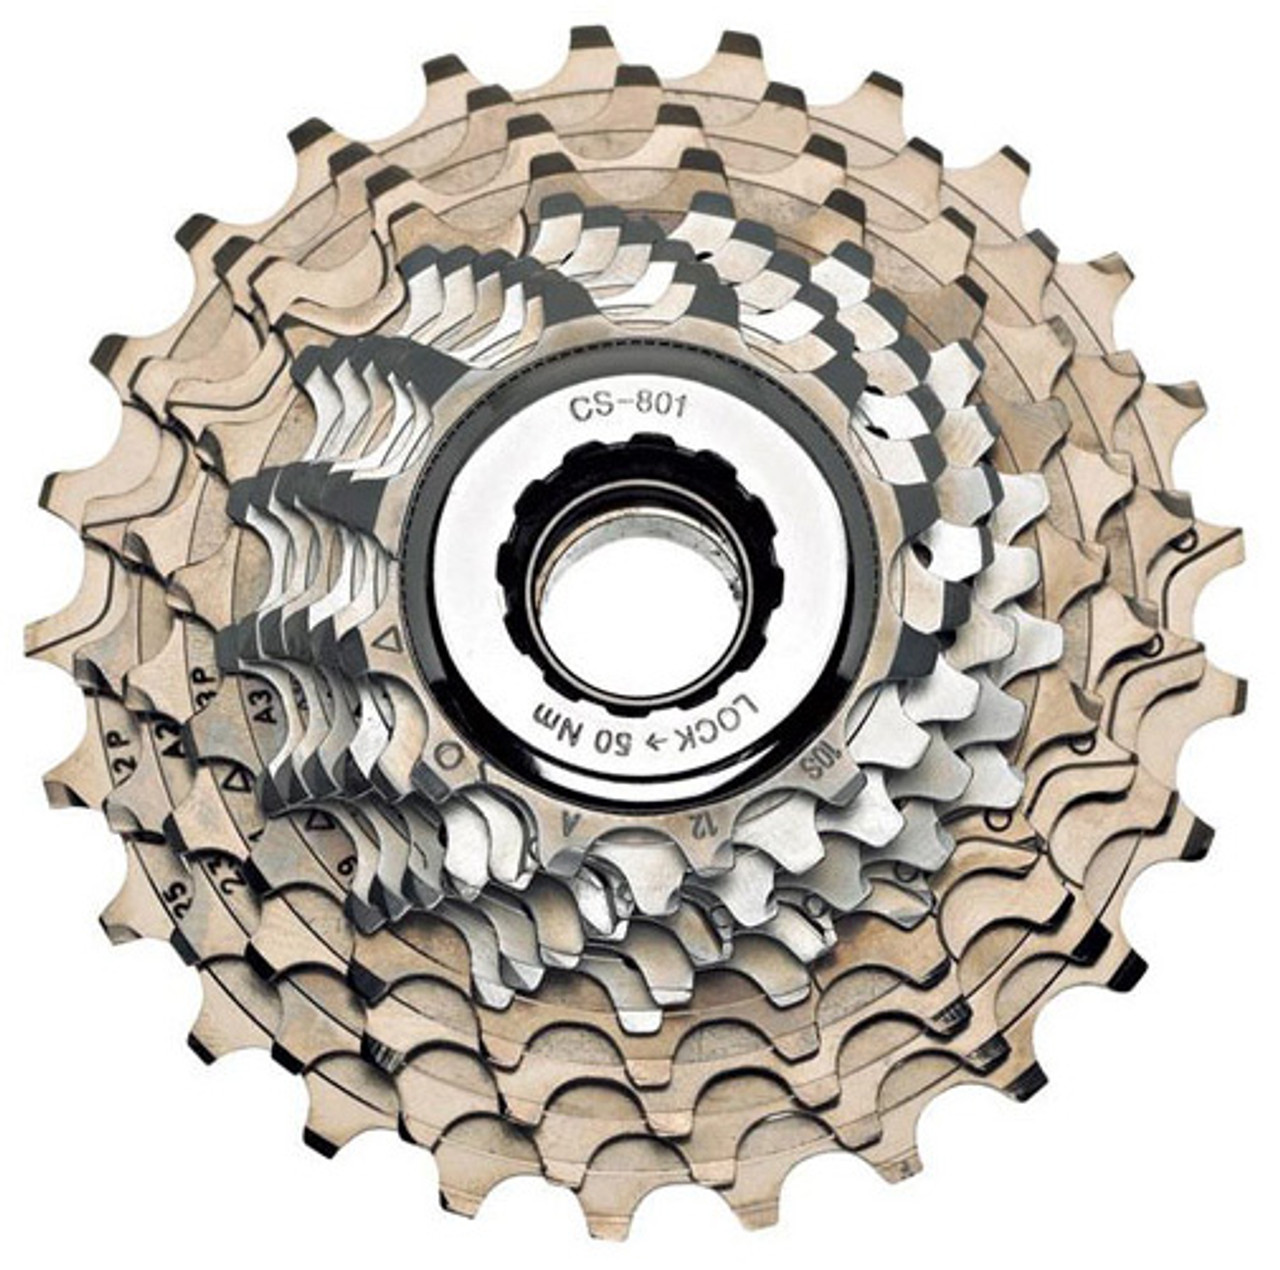 Campagnolo Record 2008 9 Speed Part Titanium Cassette 13-23